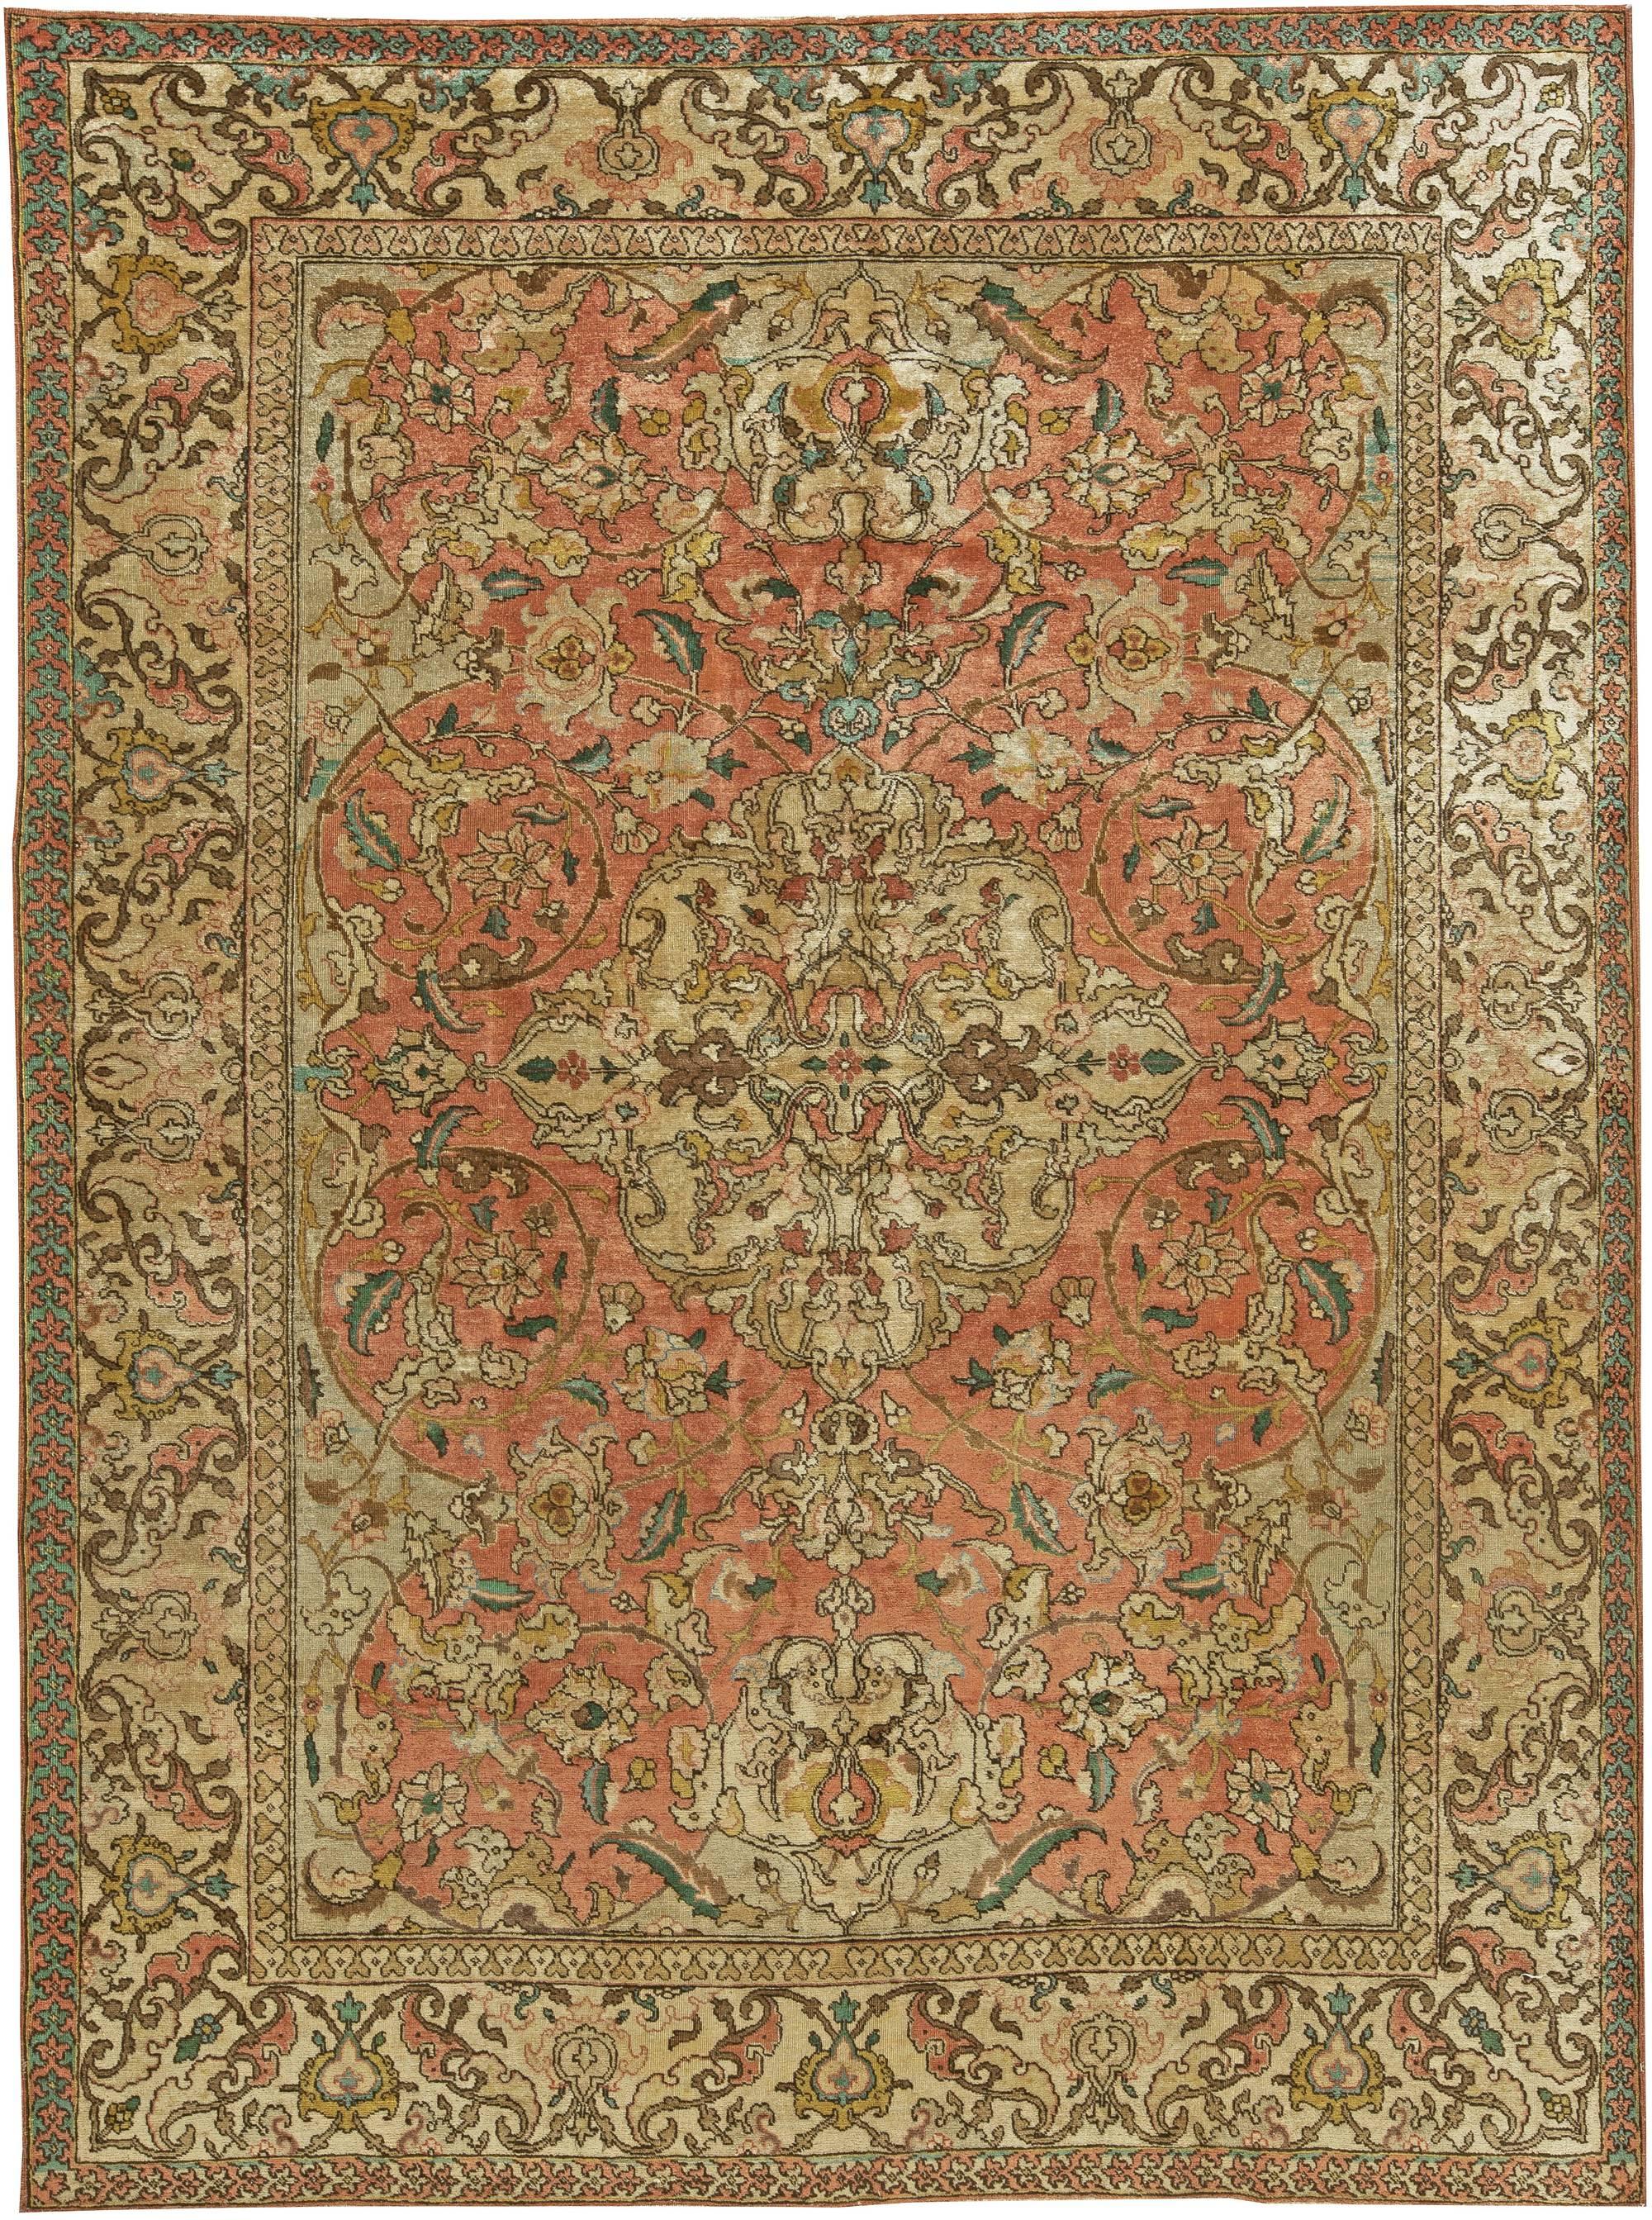 Tabriz Rugs Amp Carpets Antique Persian Tabriz Carpets